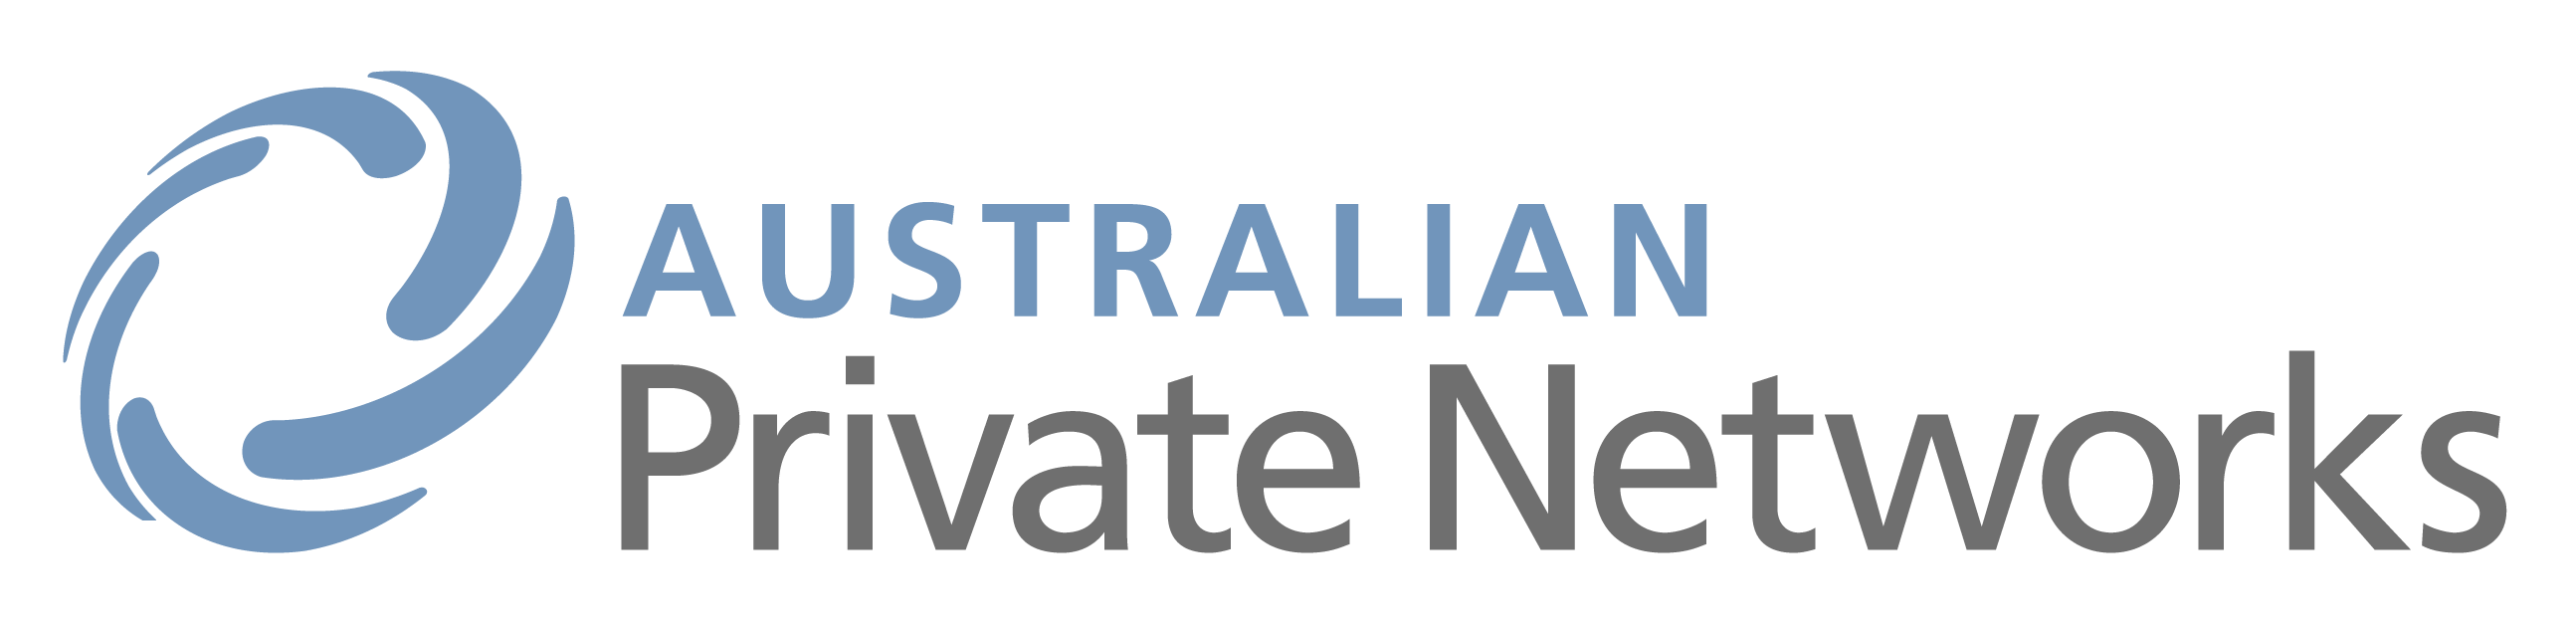 Australian Private Networks